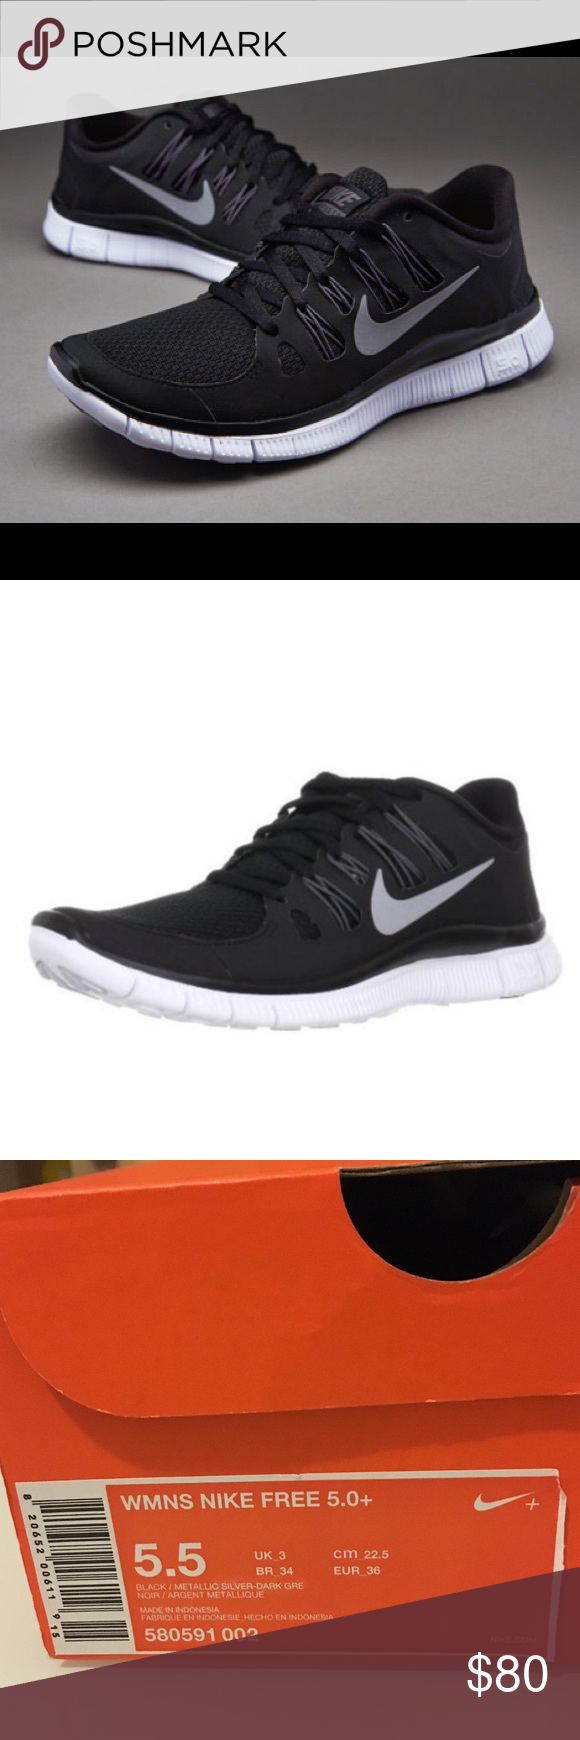 WMNS NIKE FREE 5.0+ Brand new women Nike free 5.0+ black/metallic silver